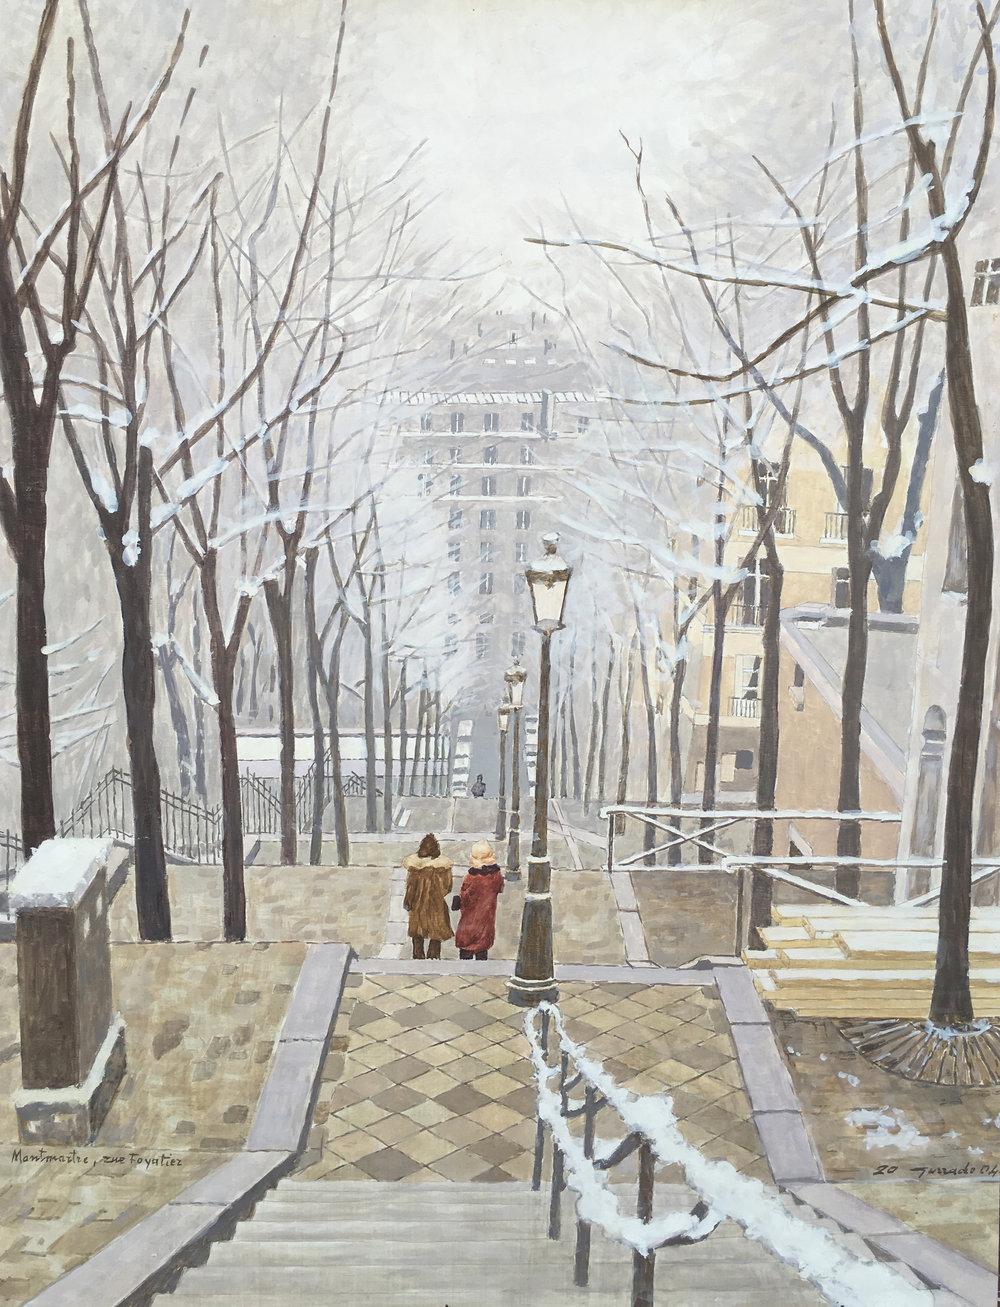 Montmartre La rue Foyatier d'inverno